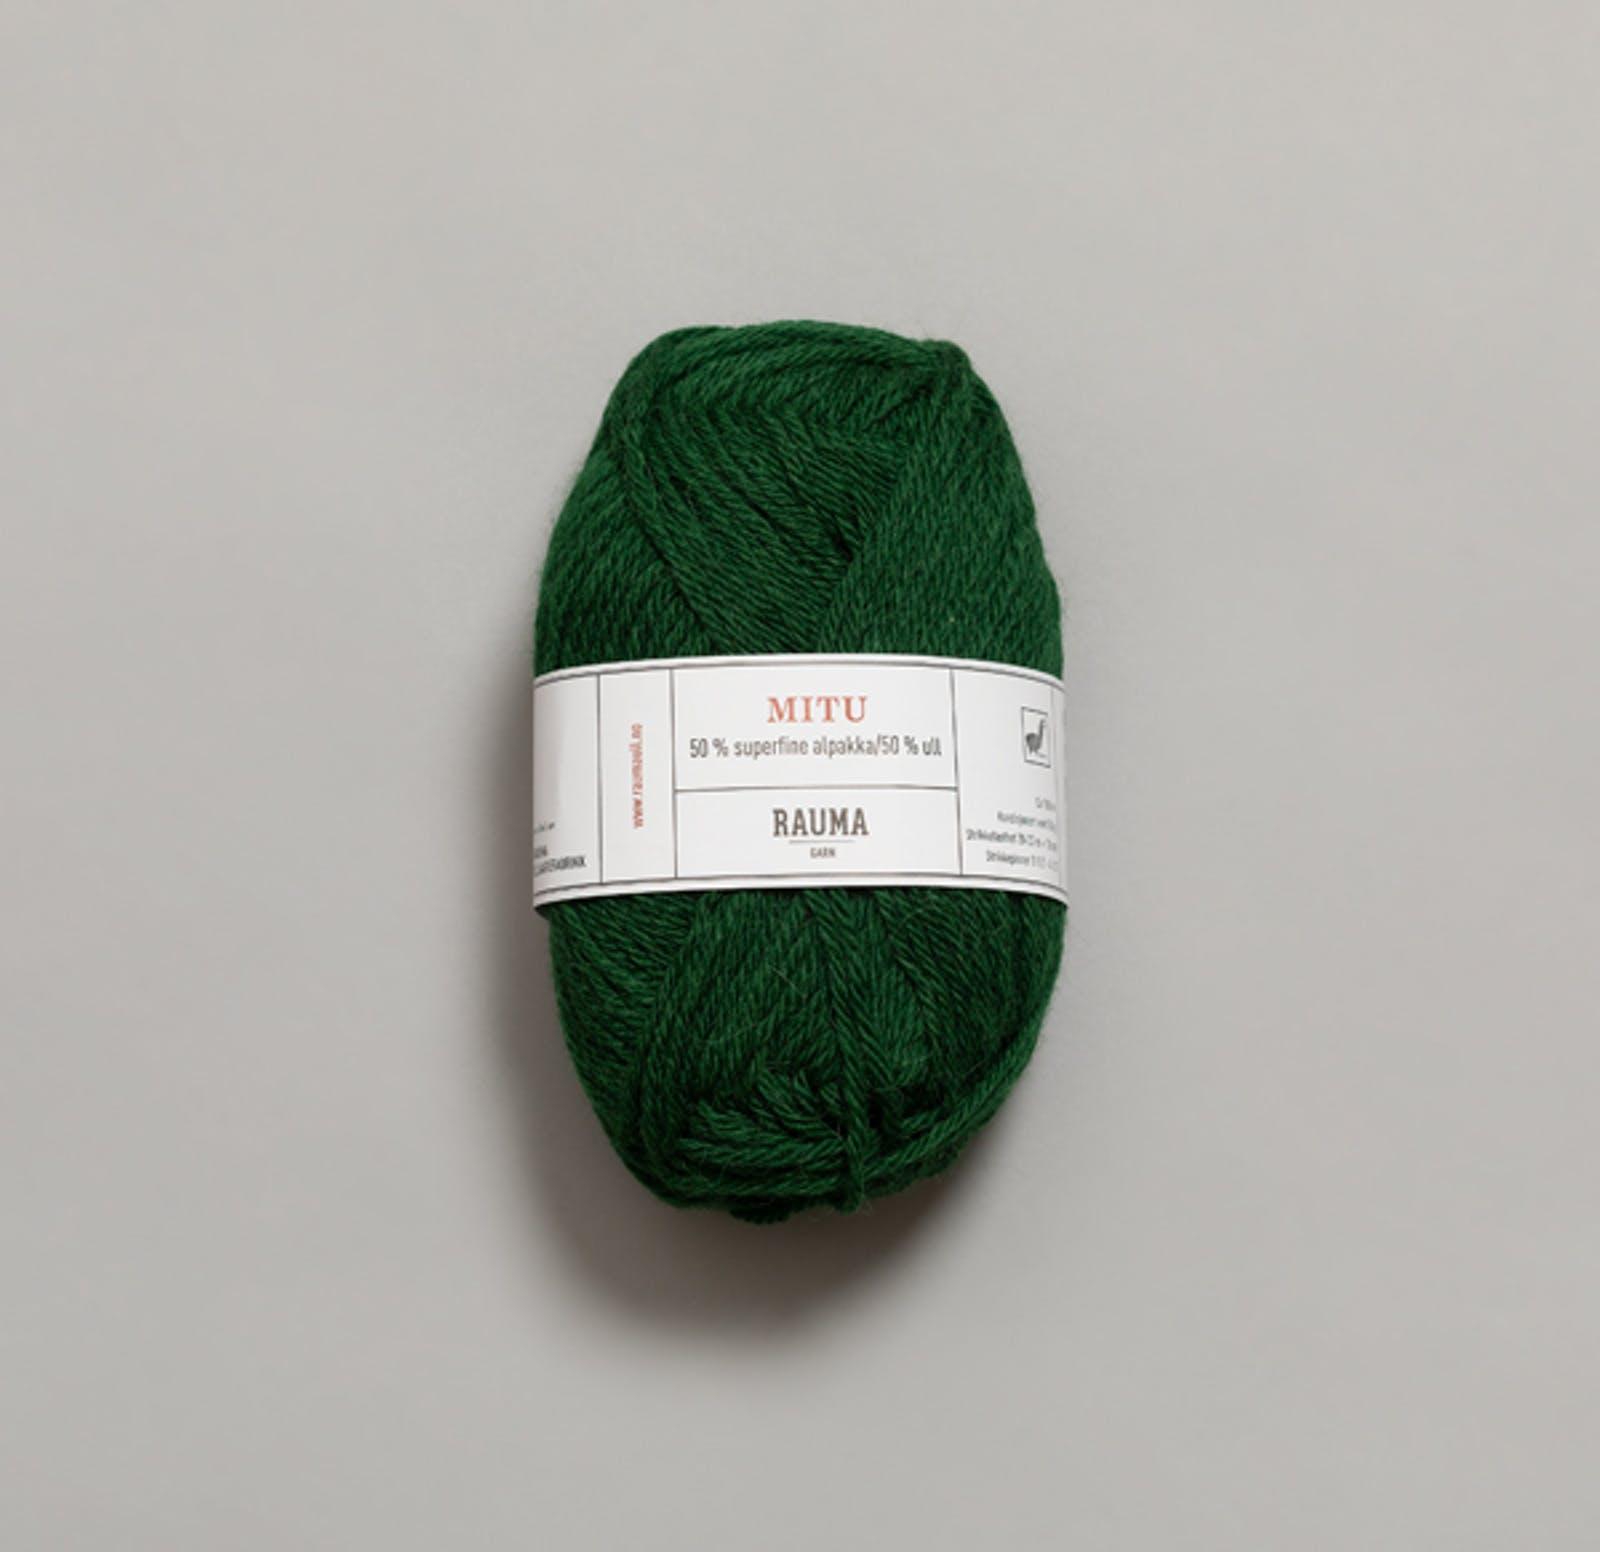 0062 Dyp grøn - MITU